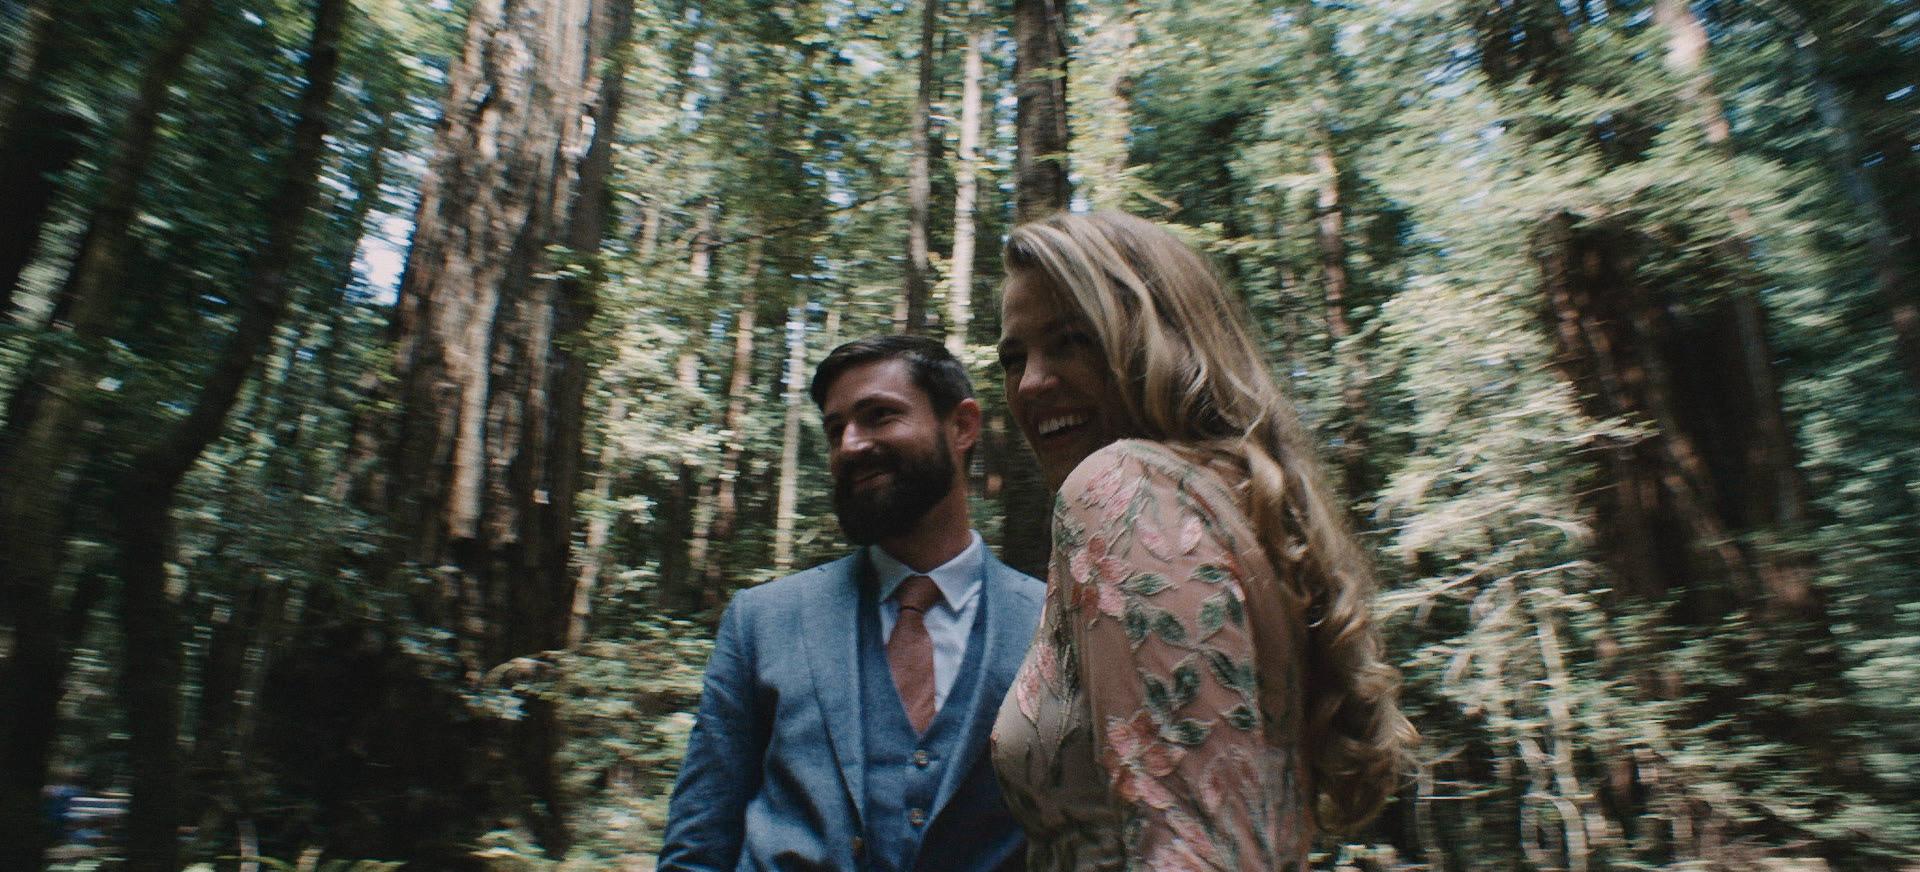 Jessica + Andrew | Guerneville, California | Dawn Ranch Lodge